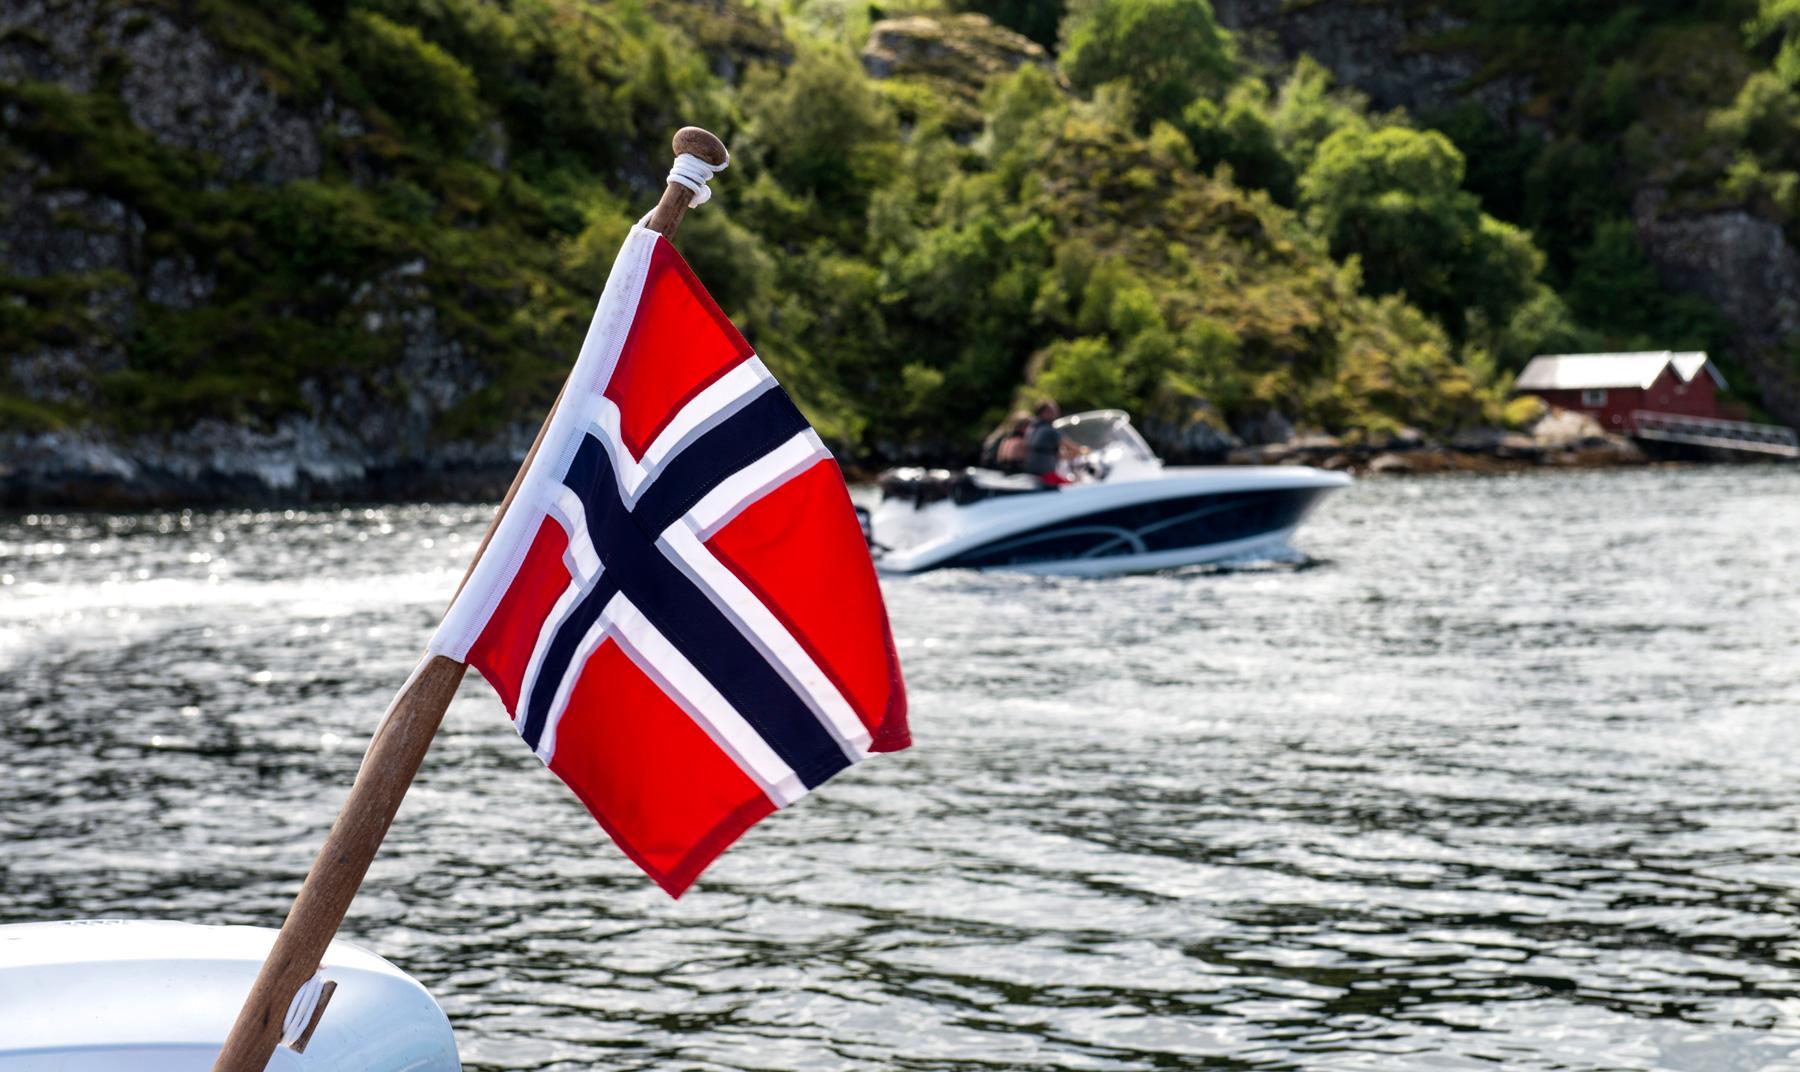 Sjølivet på Knarrlagsundet med det norske flagget på båten